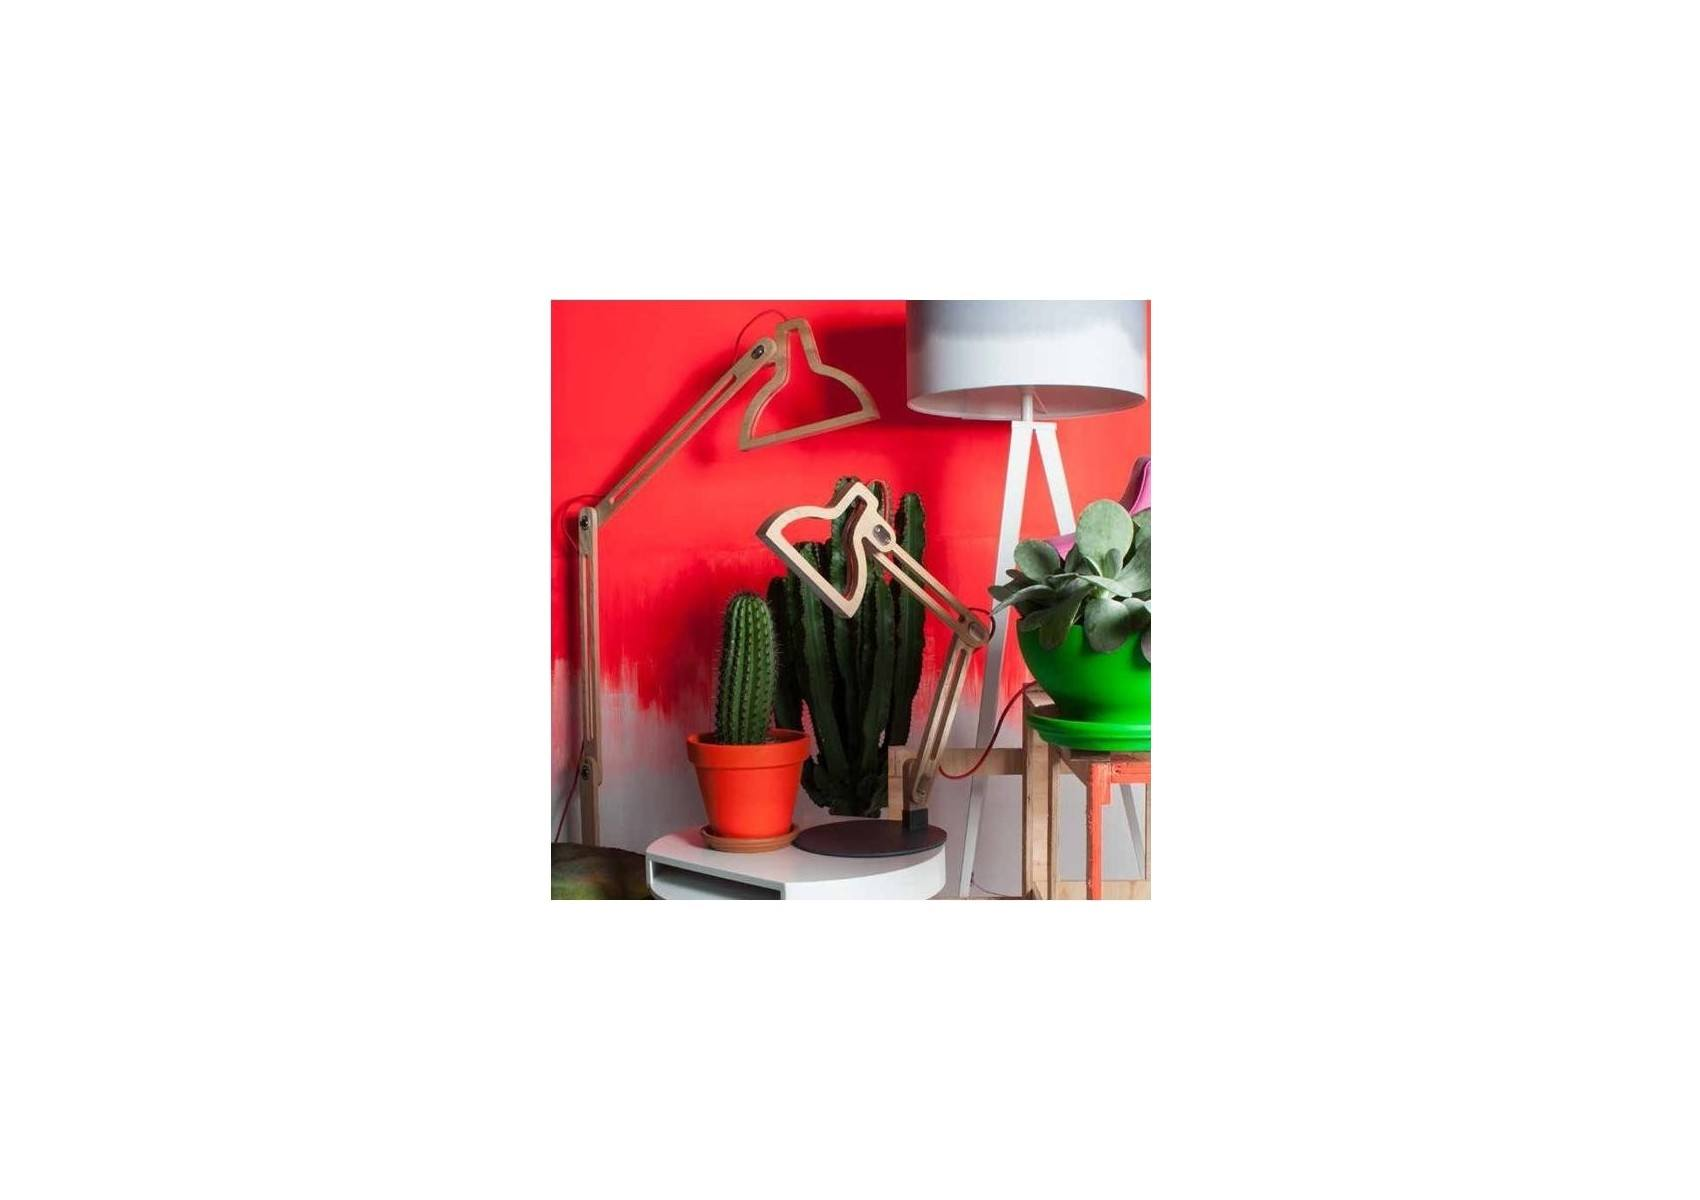 Led Be De À Design It Table Deco Boite Lampe Zuiver Yb6gIvf7y